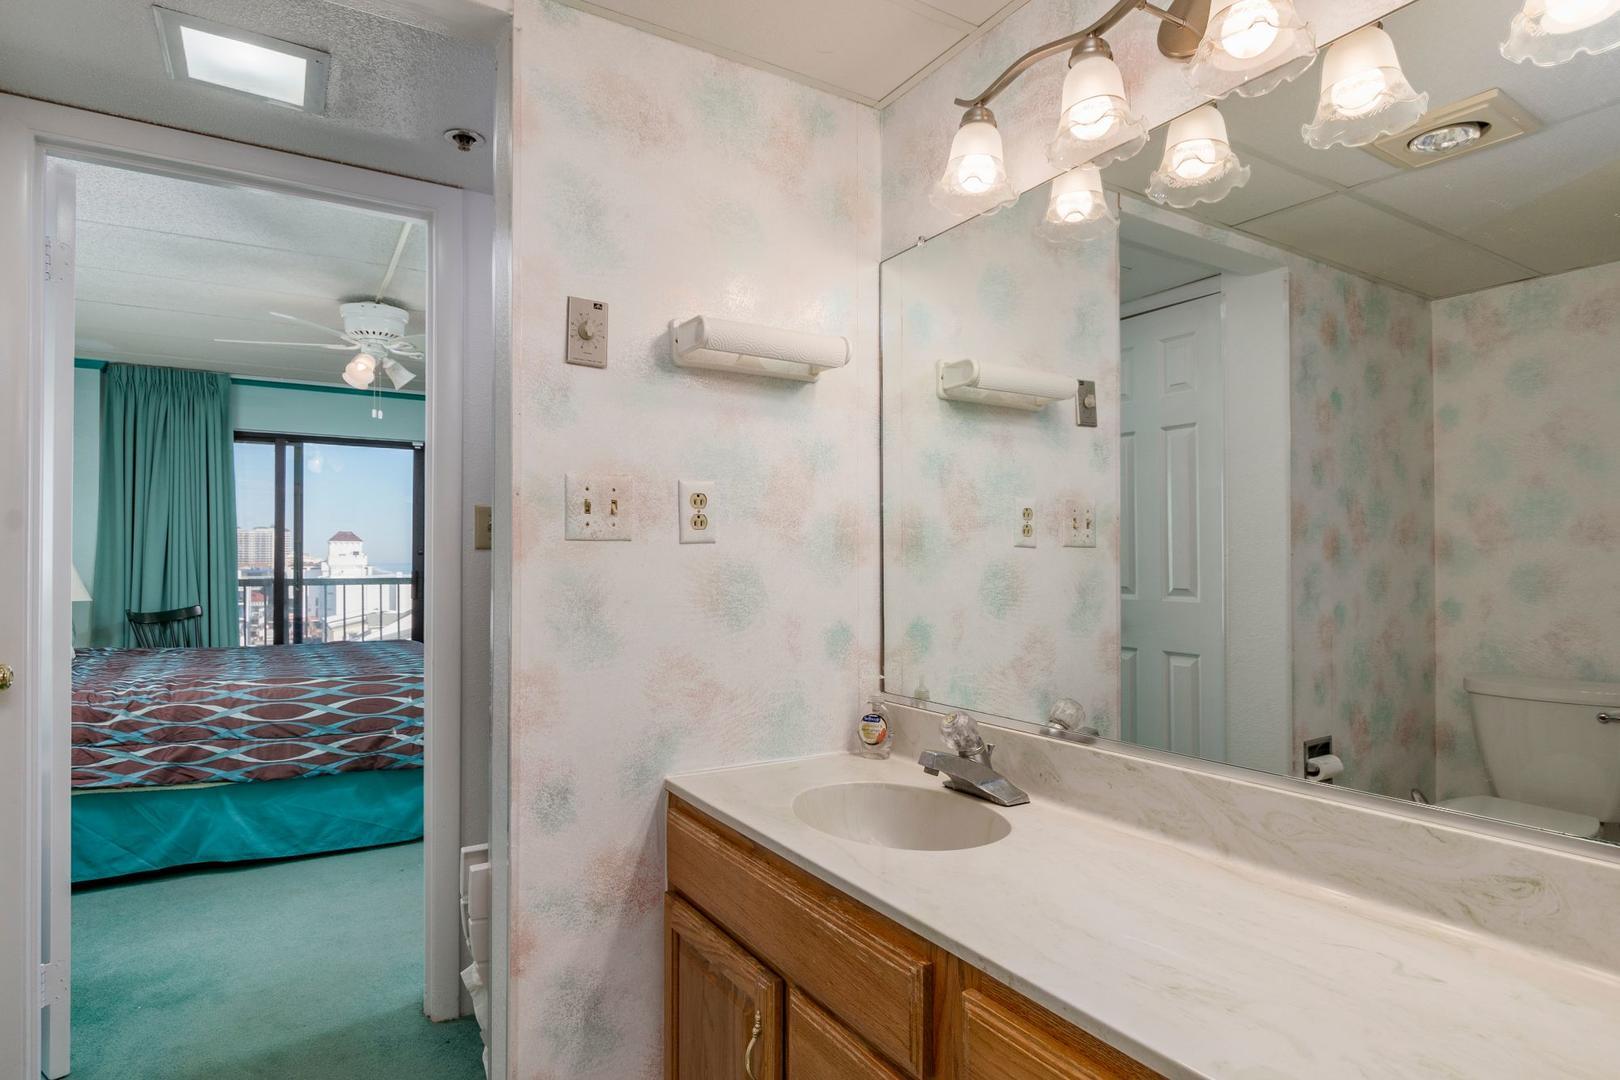 Summer Beach 605 - Bathroom 1